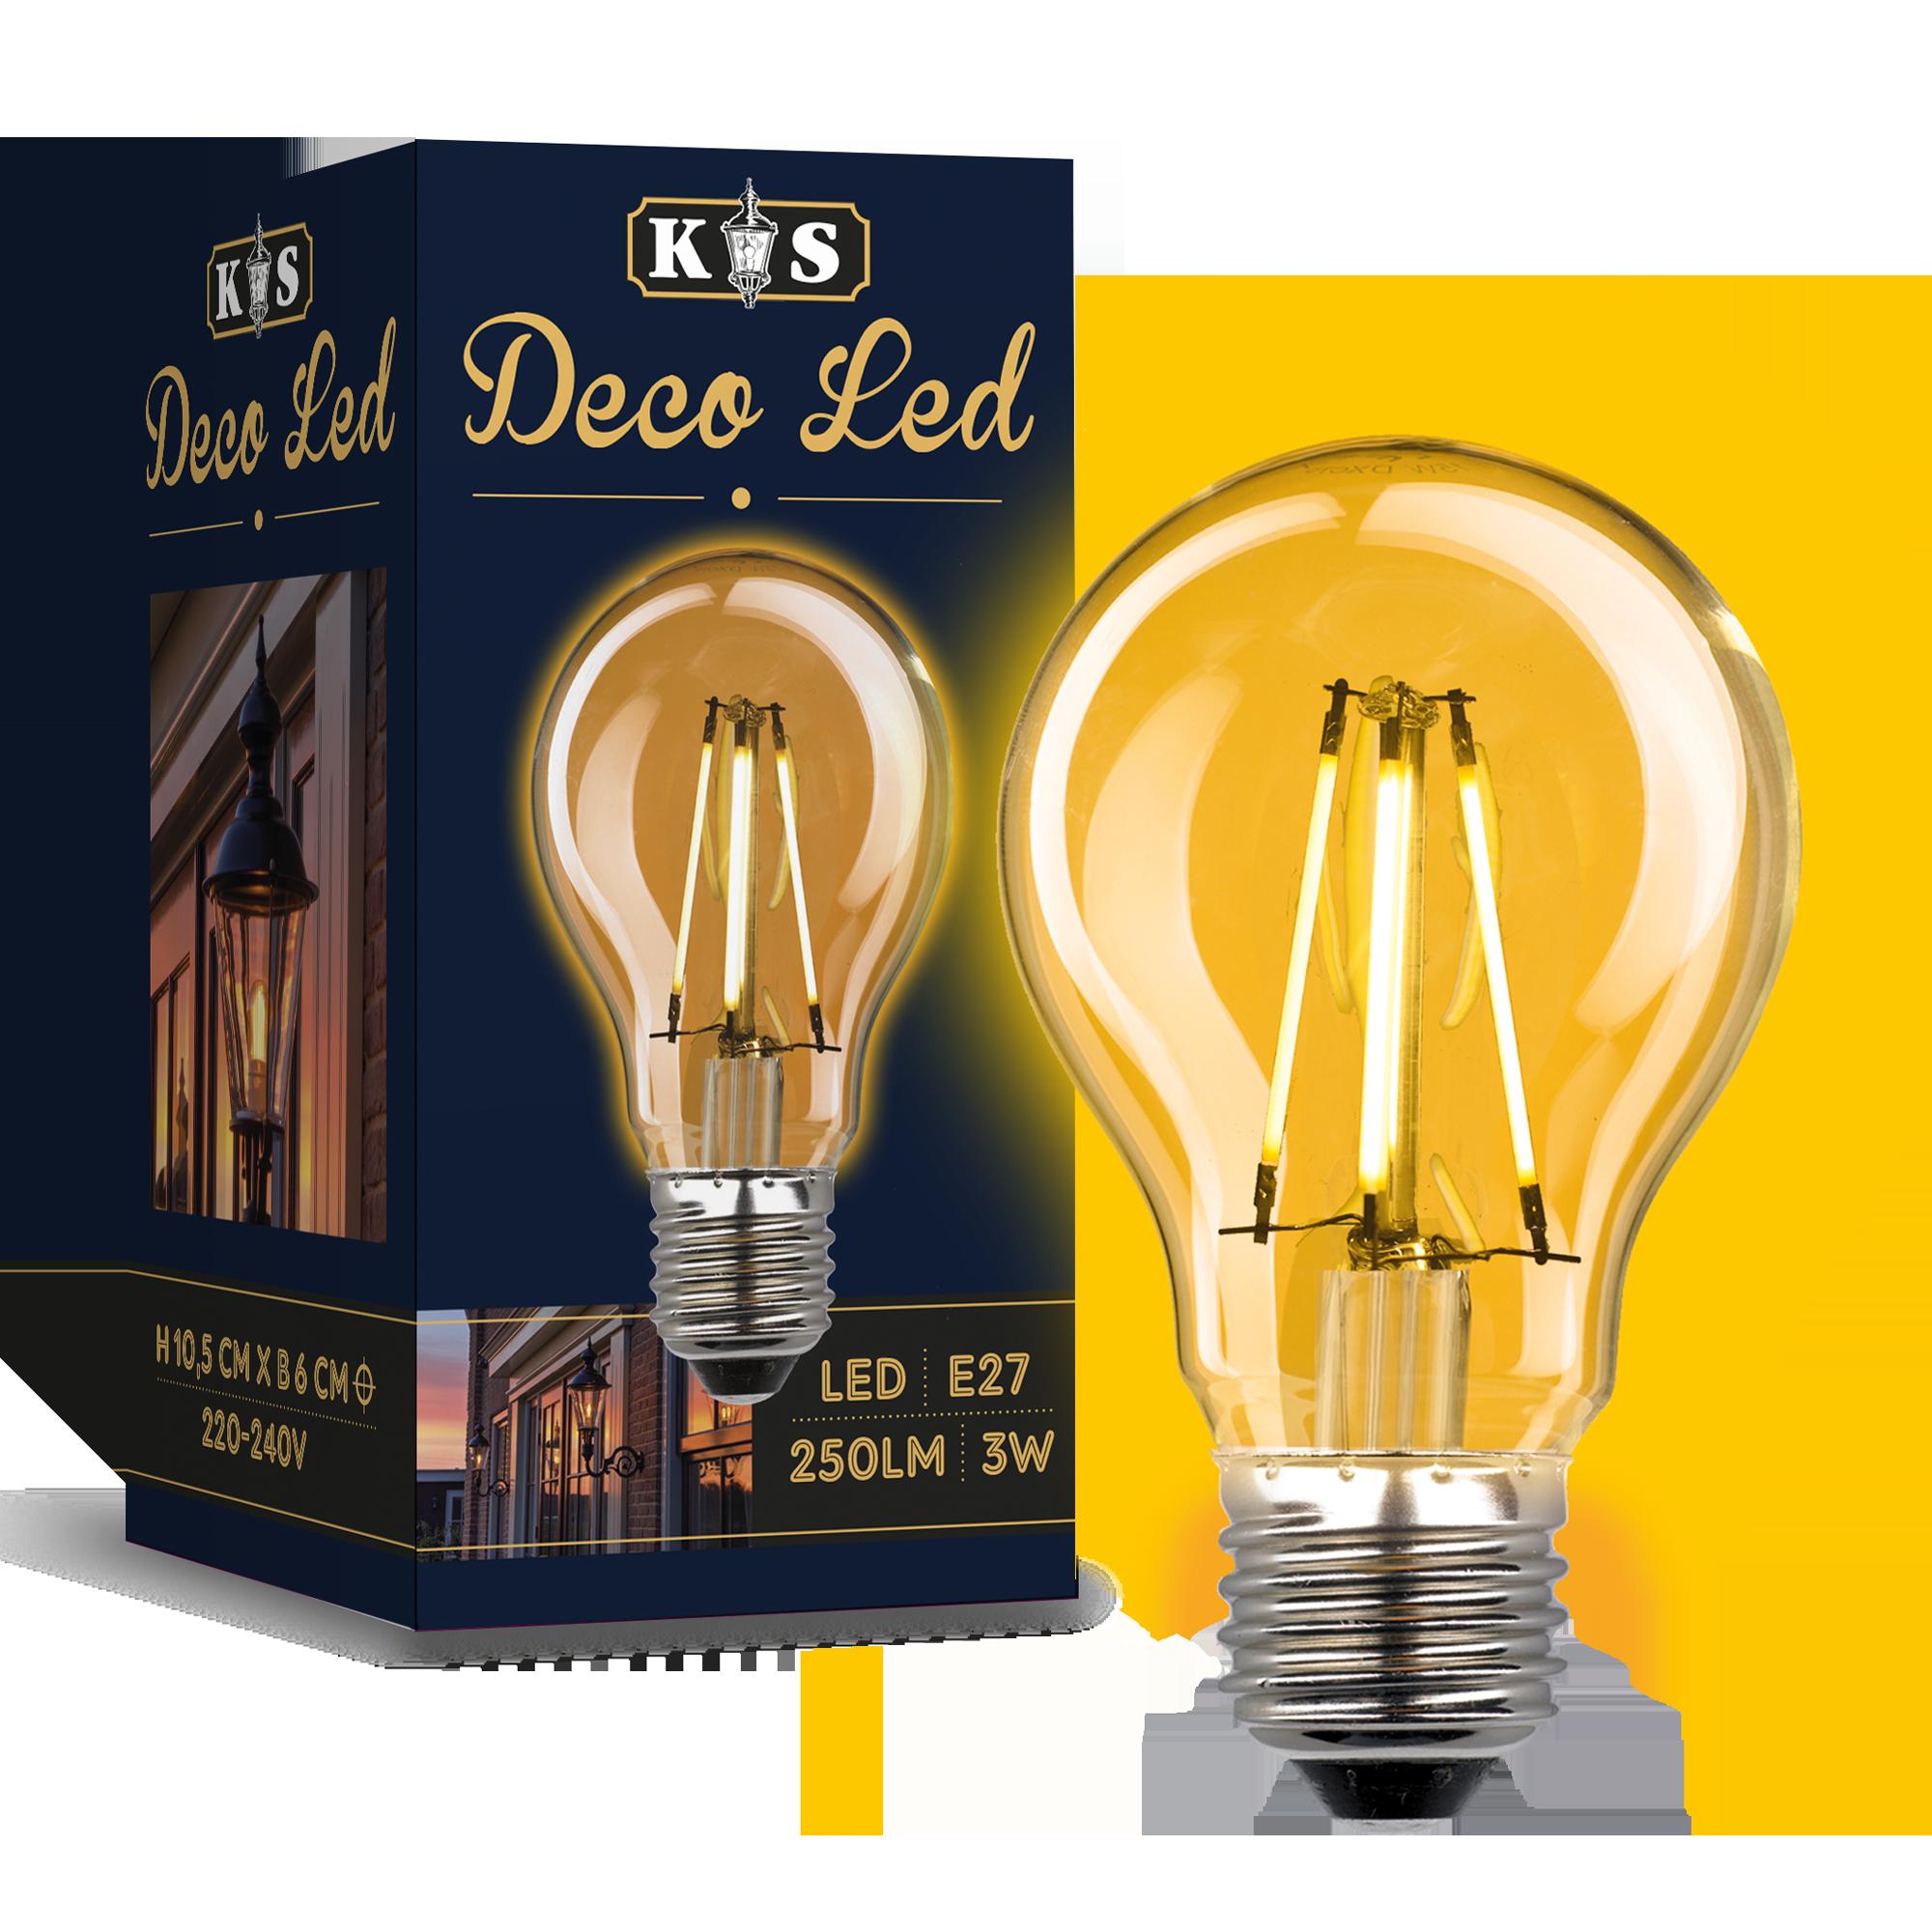 Deco LED KS Verlichting